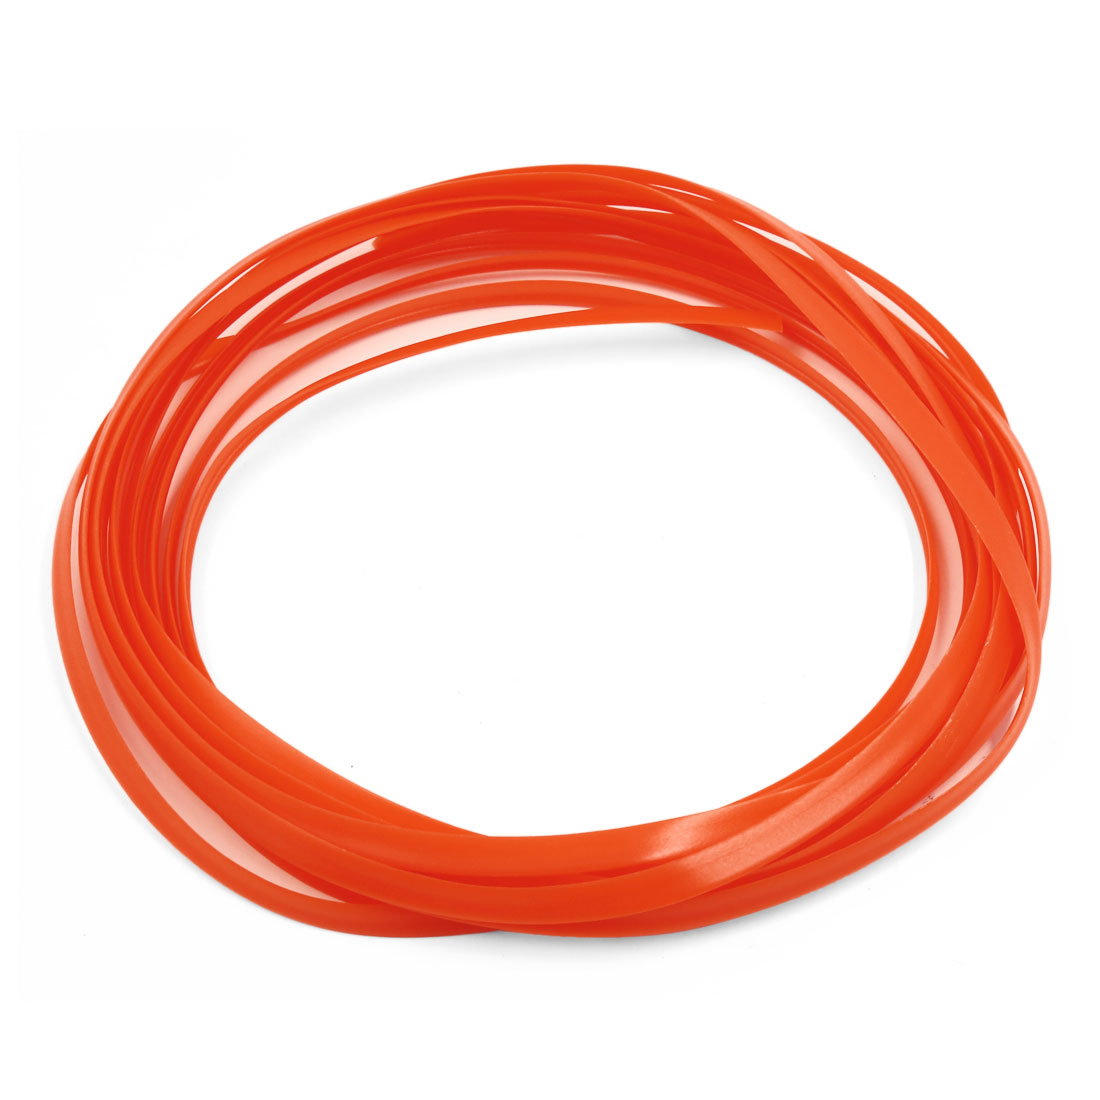 5M Orange Flexible Trim for Car Interior Exterrior Moulding Strip Decorative Line